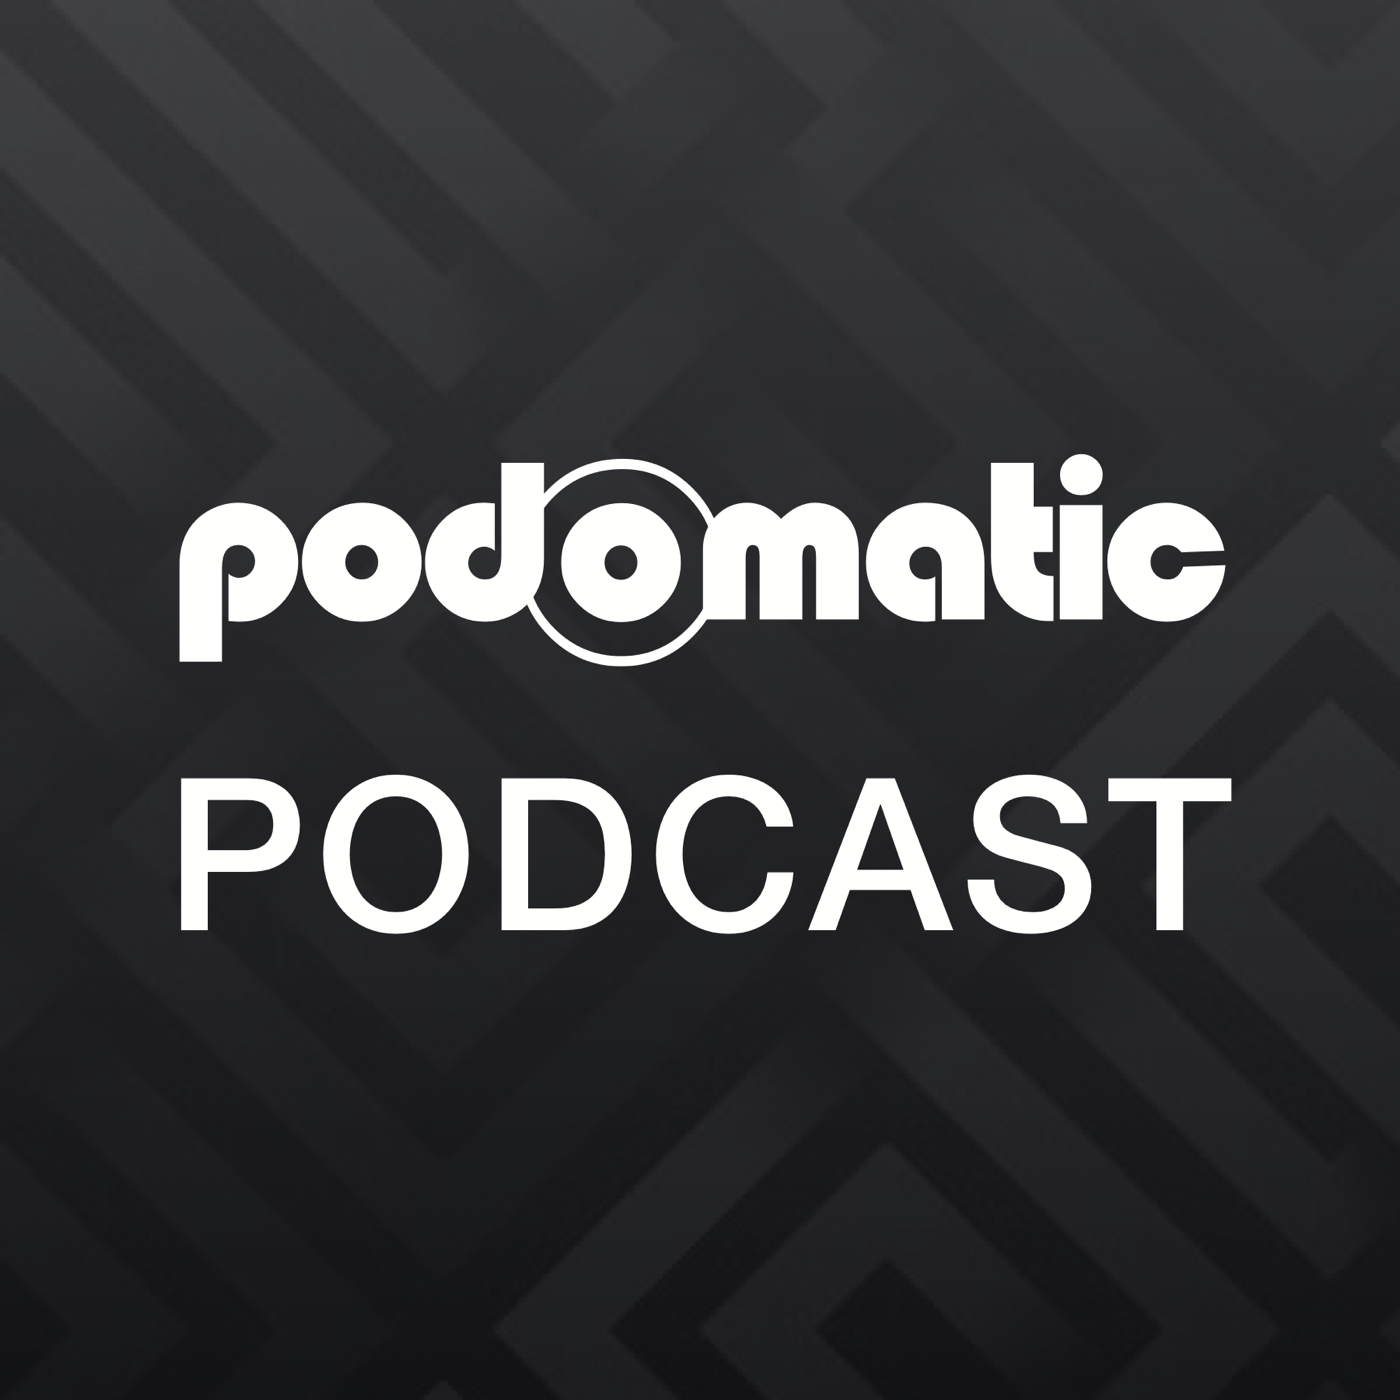 Claire O'Dowd's Podcast